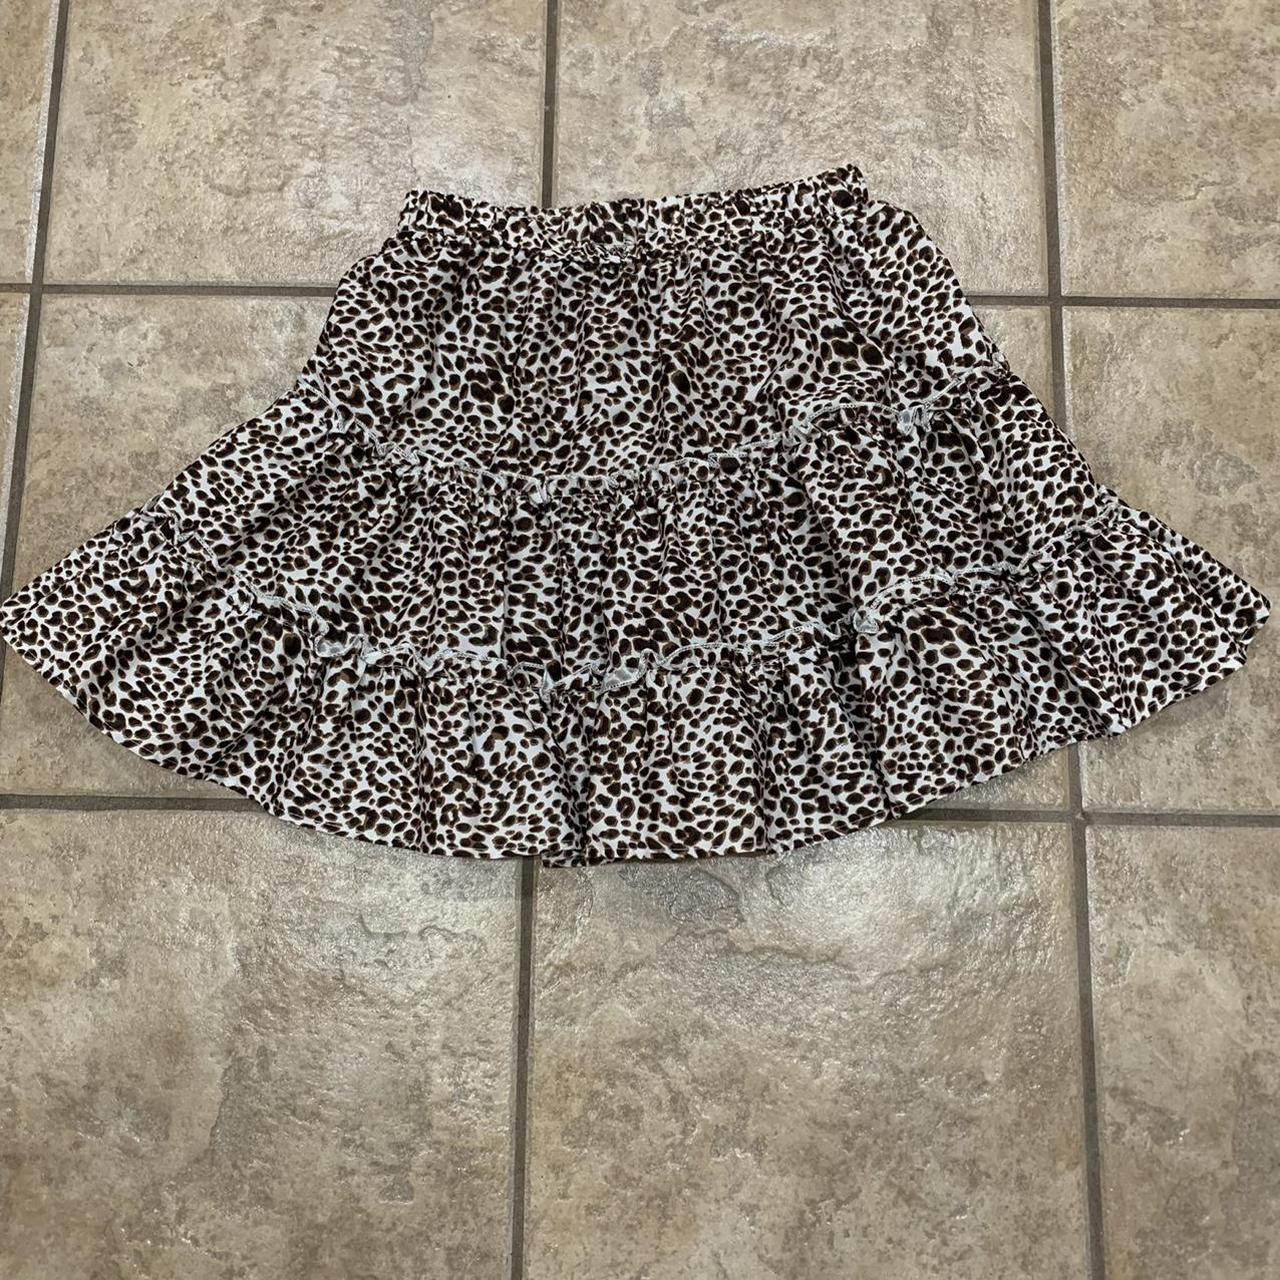 Product Image 1 - Ruffled cheetah print skirt from